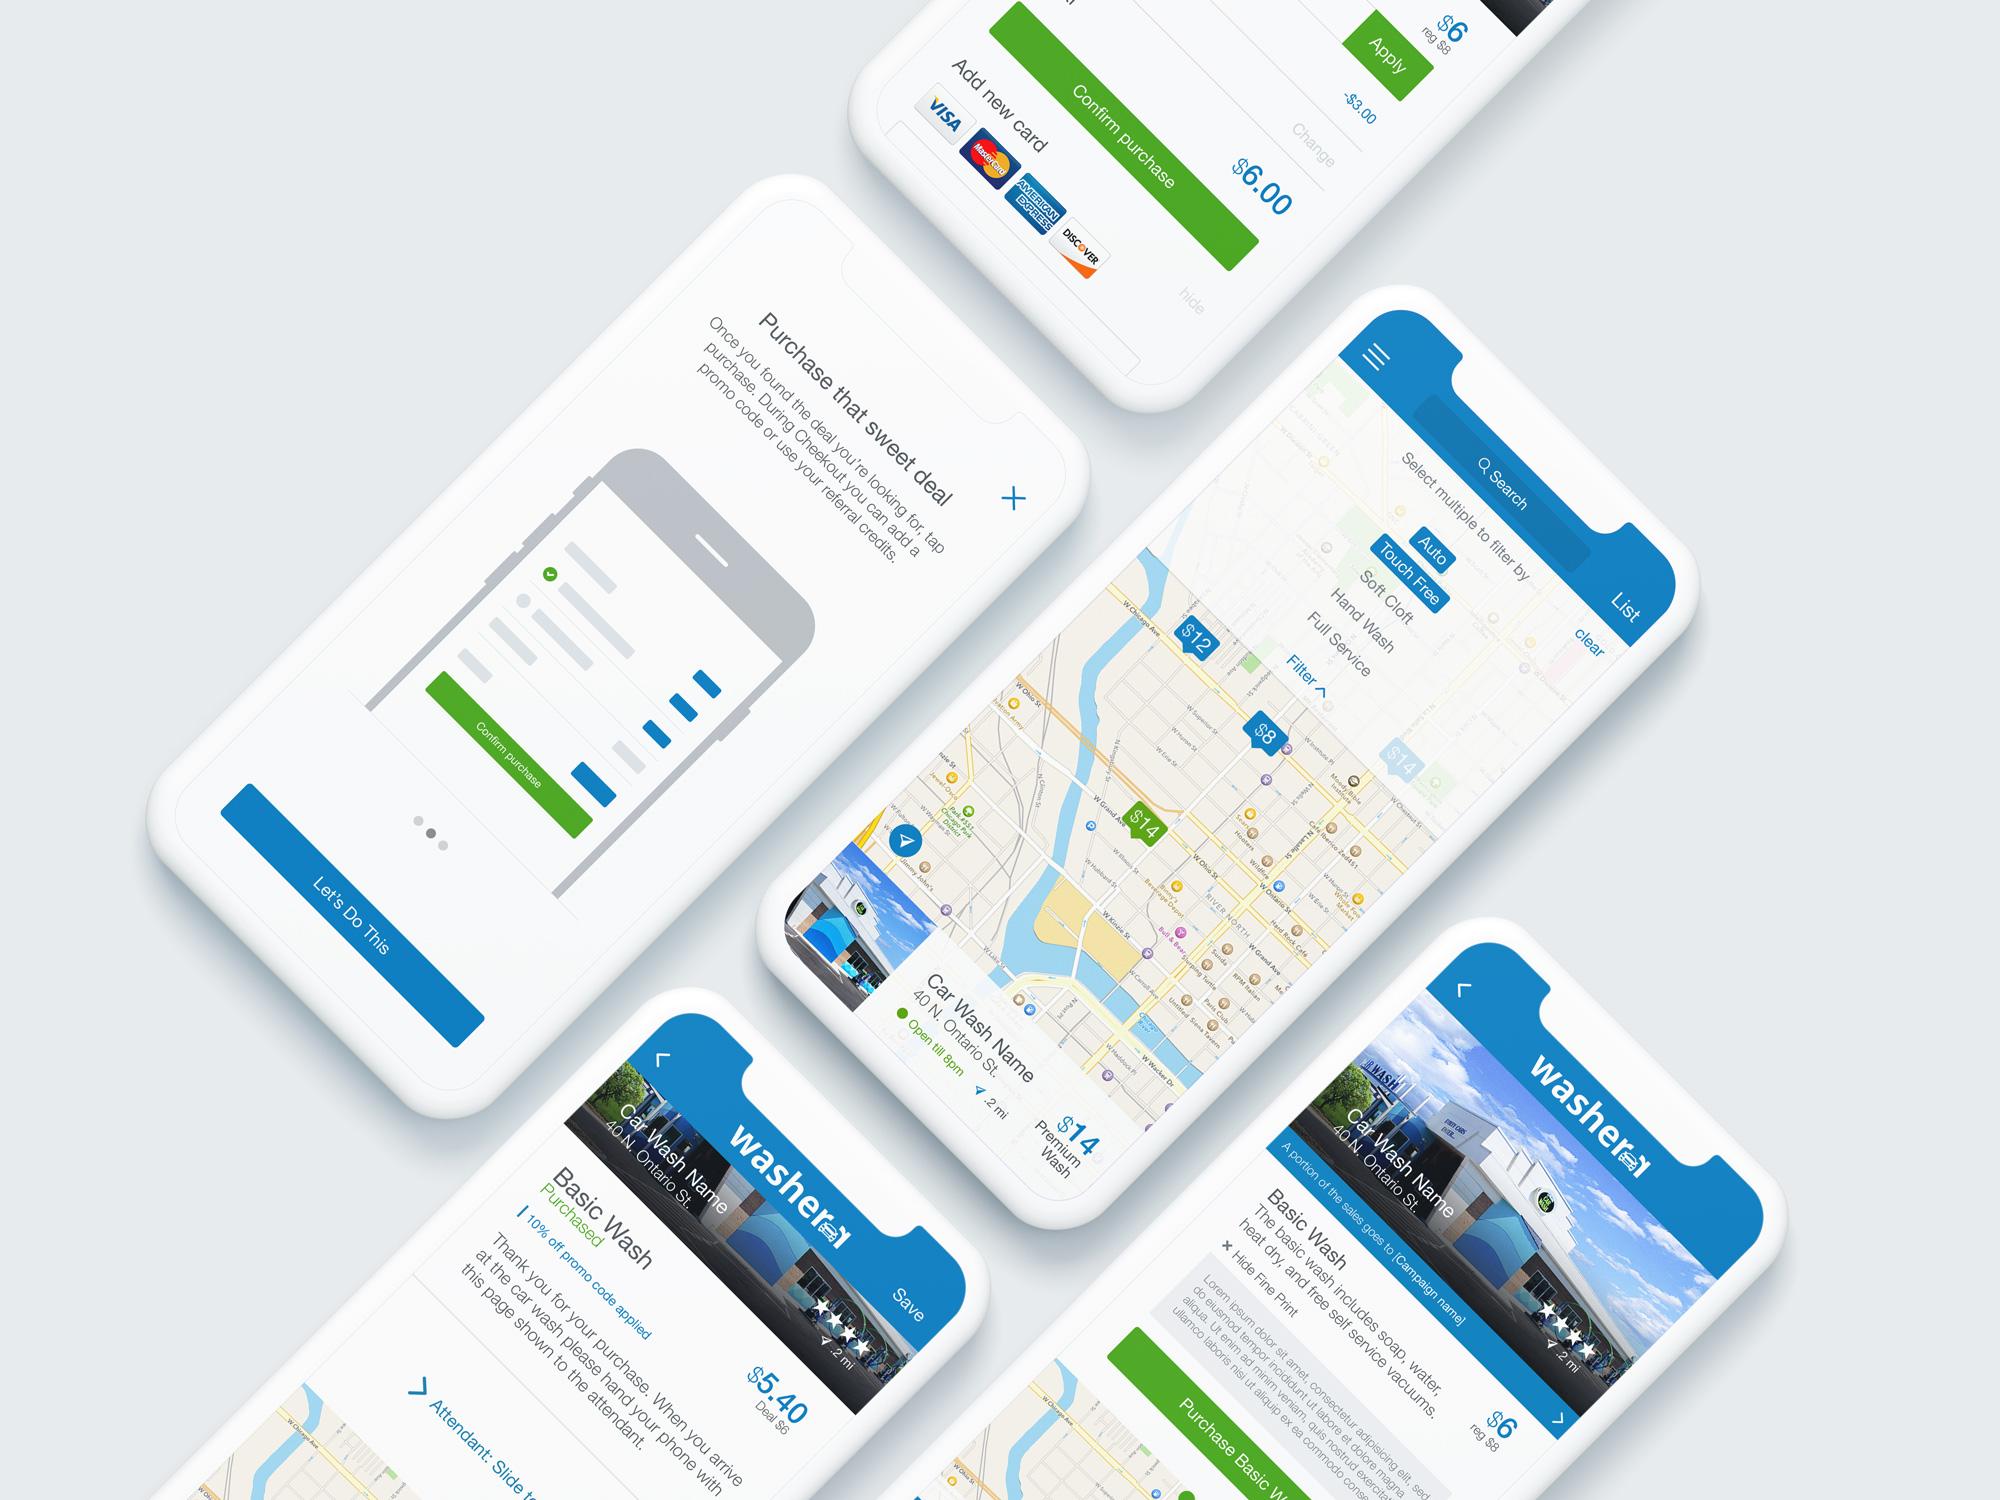 washerr app screenshots